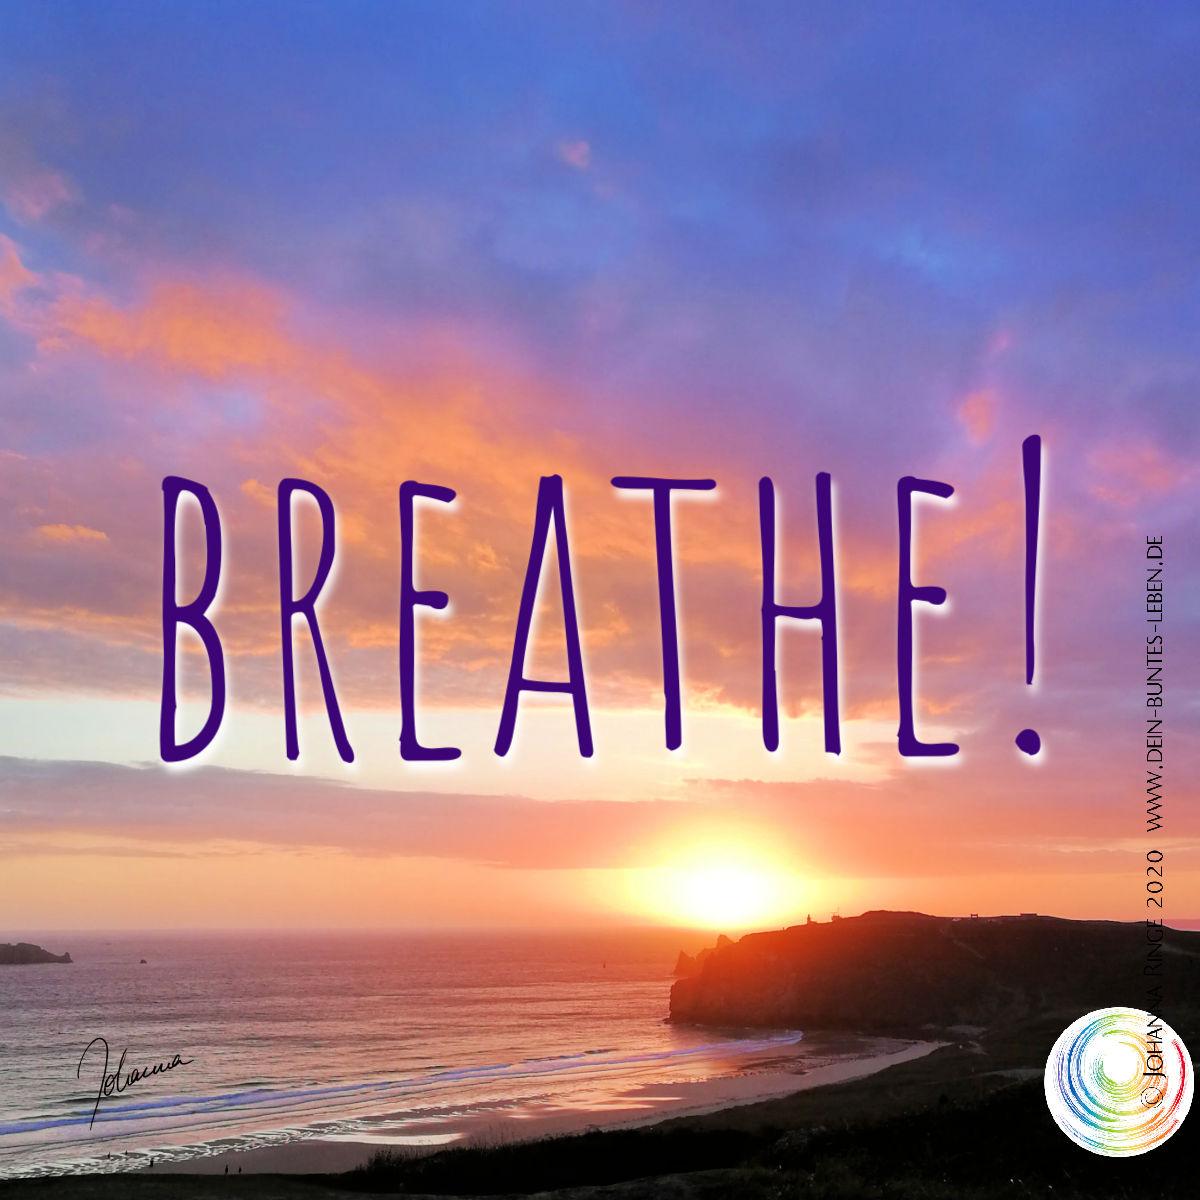 Breathe! (Text on Photograph of a beautiful sunset at the sea) ©Johanna Ringe www.johannaringe.com